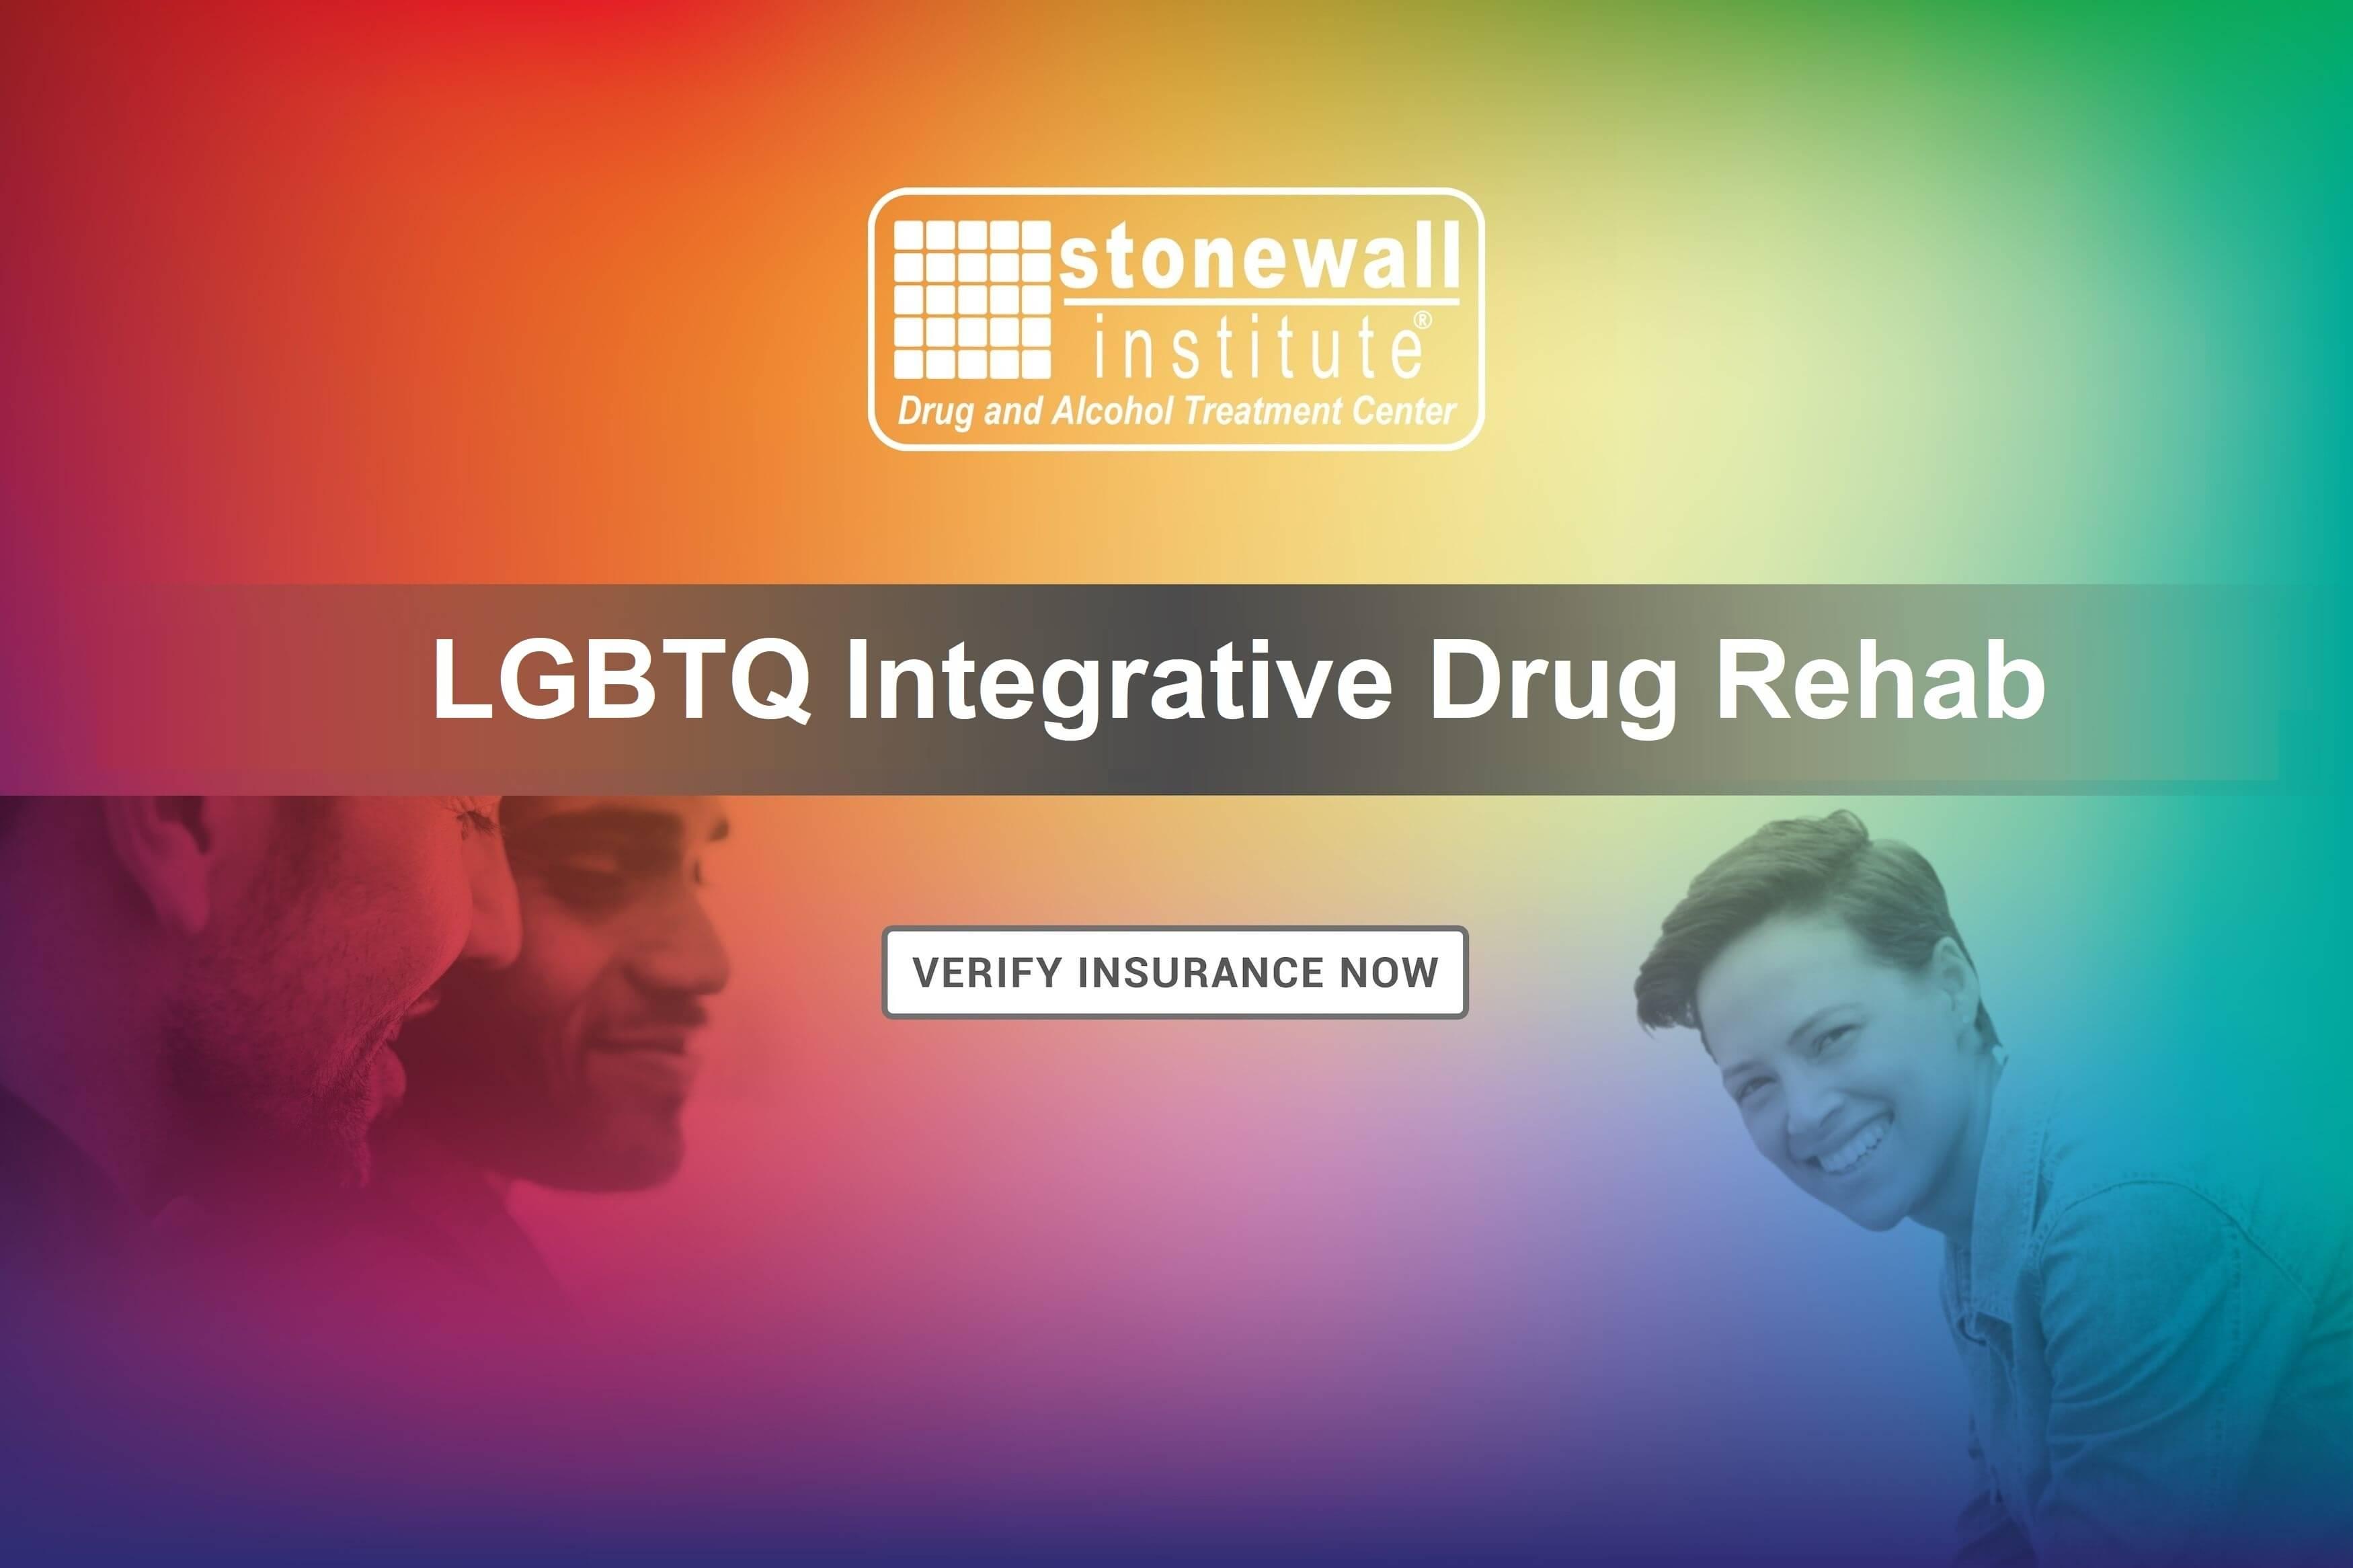 LGBTQ Integrative Drug Rehab